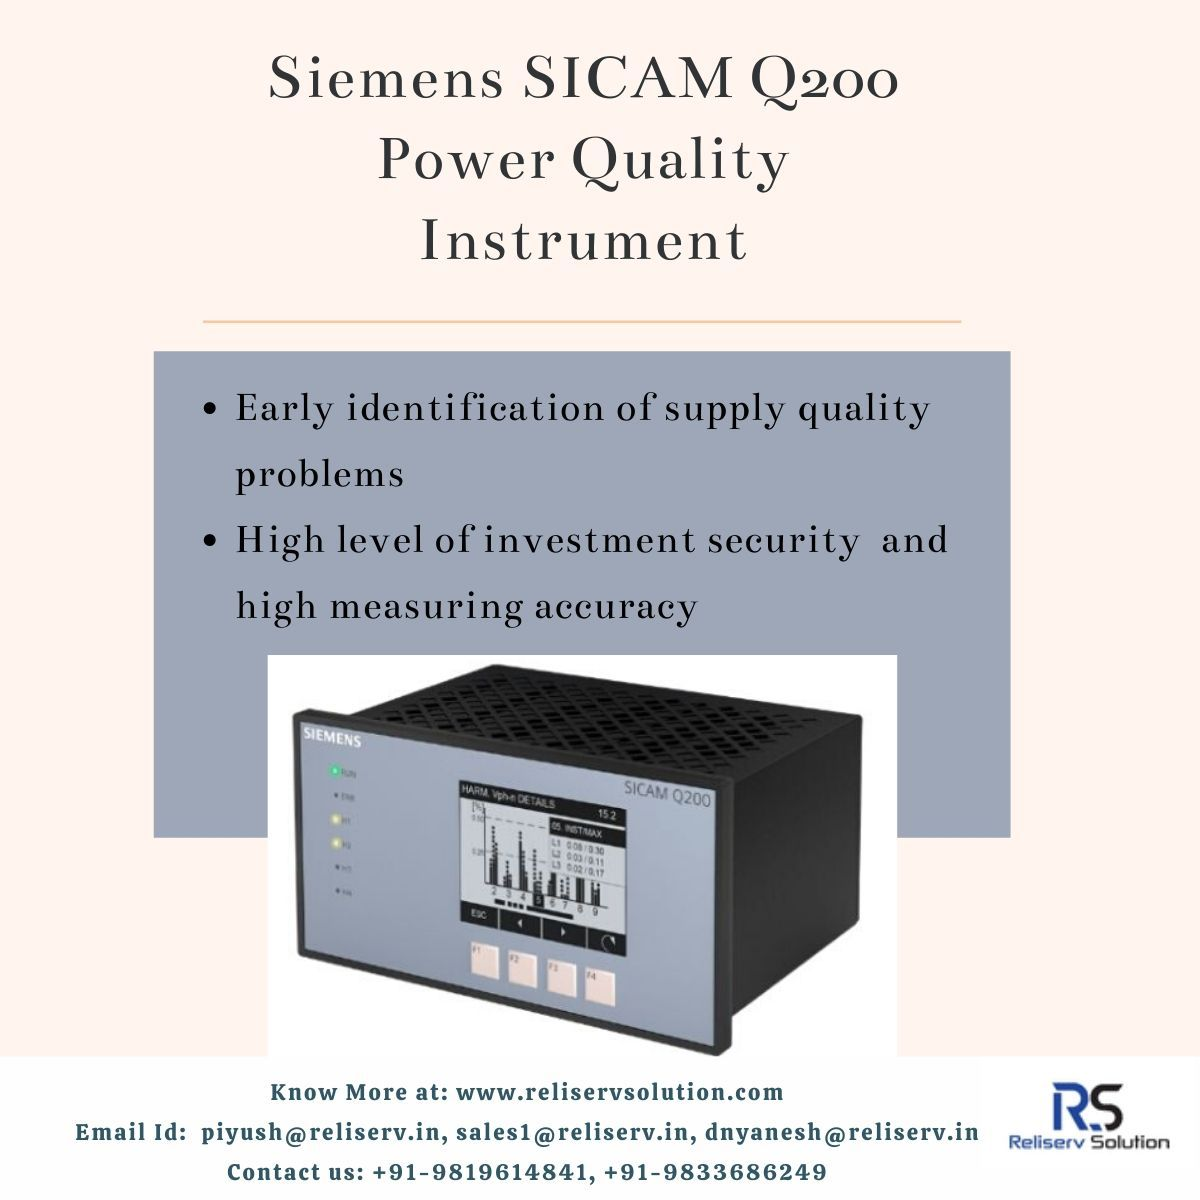 Siemens Sicam Q200 Power Quality Instrument Siemens Energy Management Power